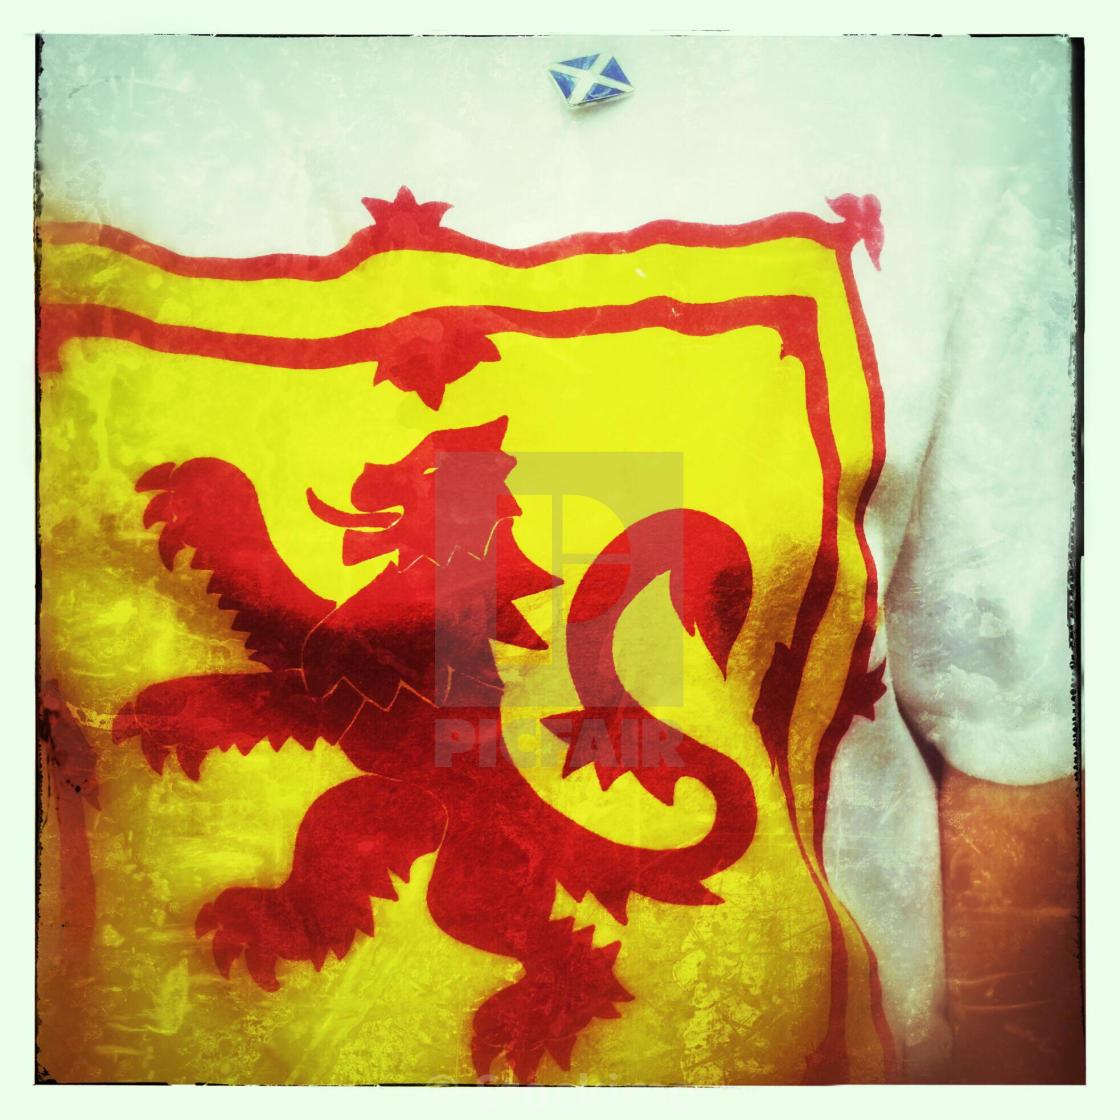 Scottish Lion Flag - Horse and Lion Photos